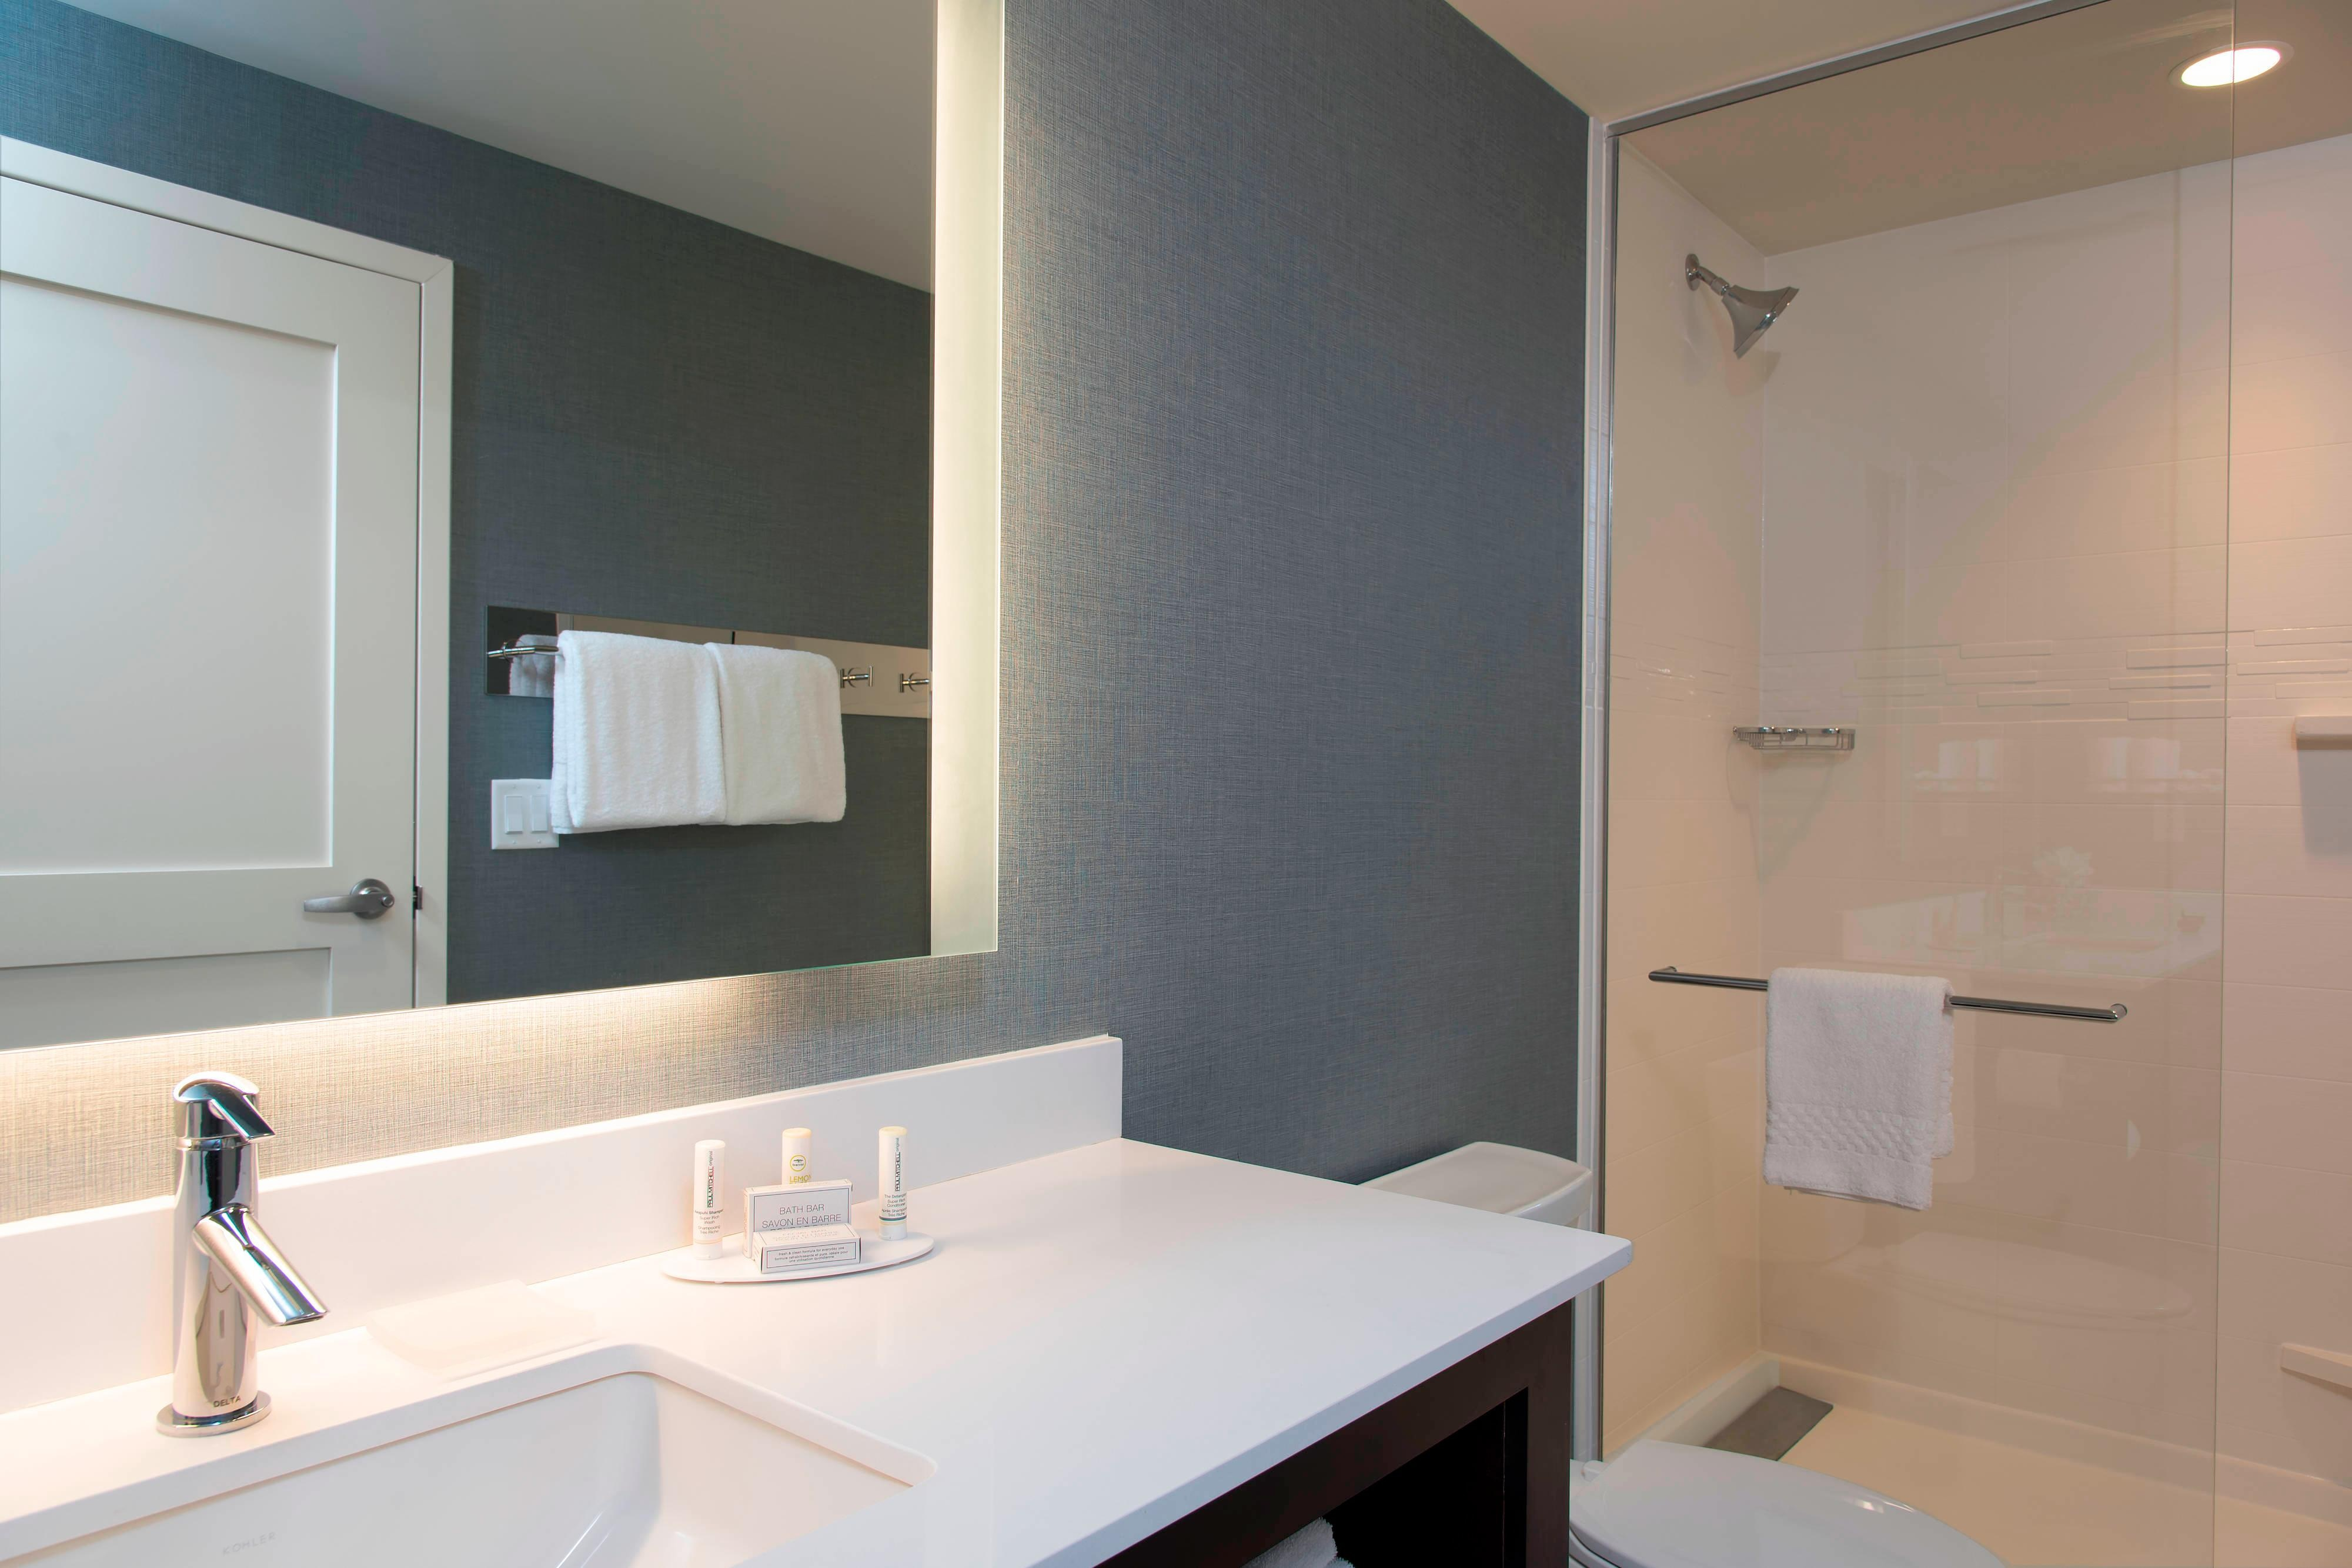 marriott, residence inn, ann arbor hotels, Michigan guest rooms